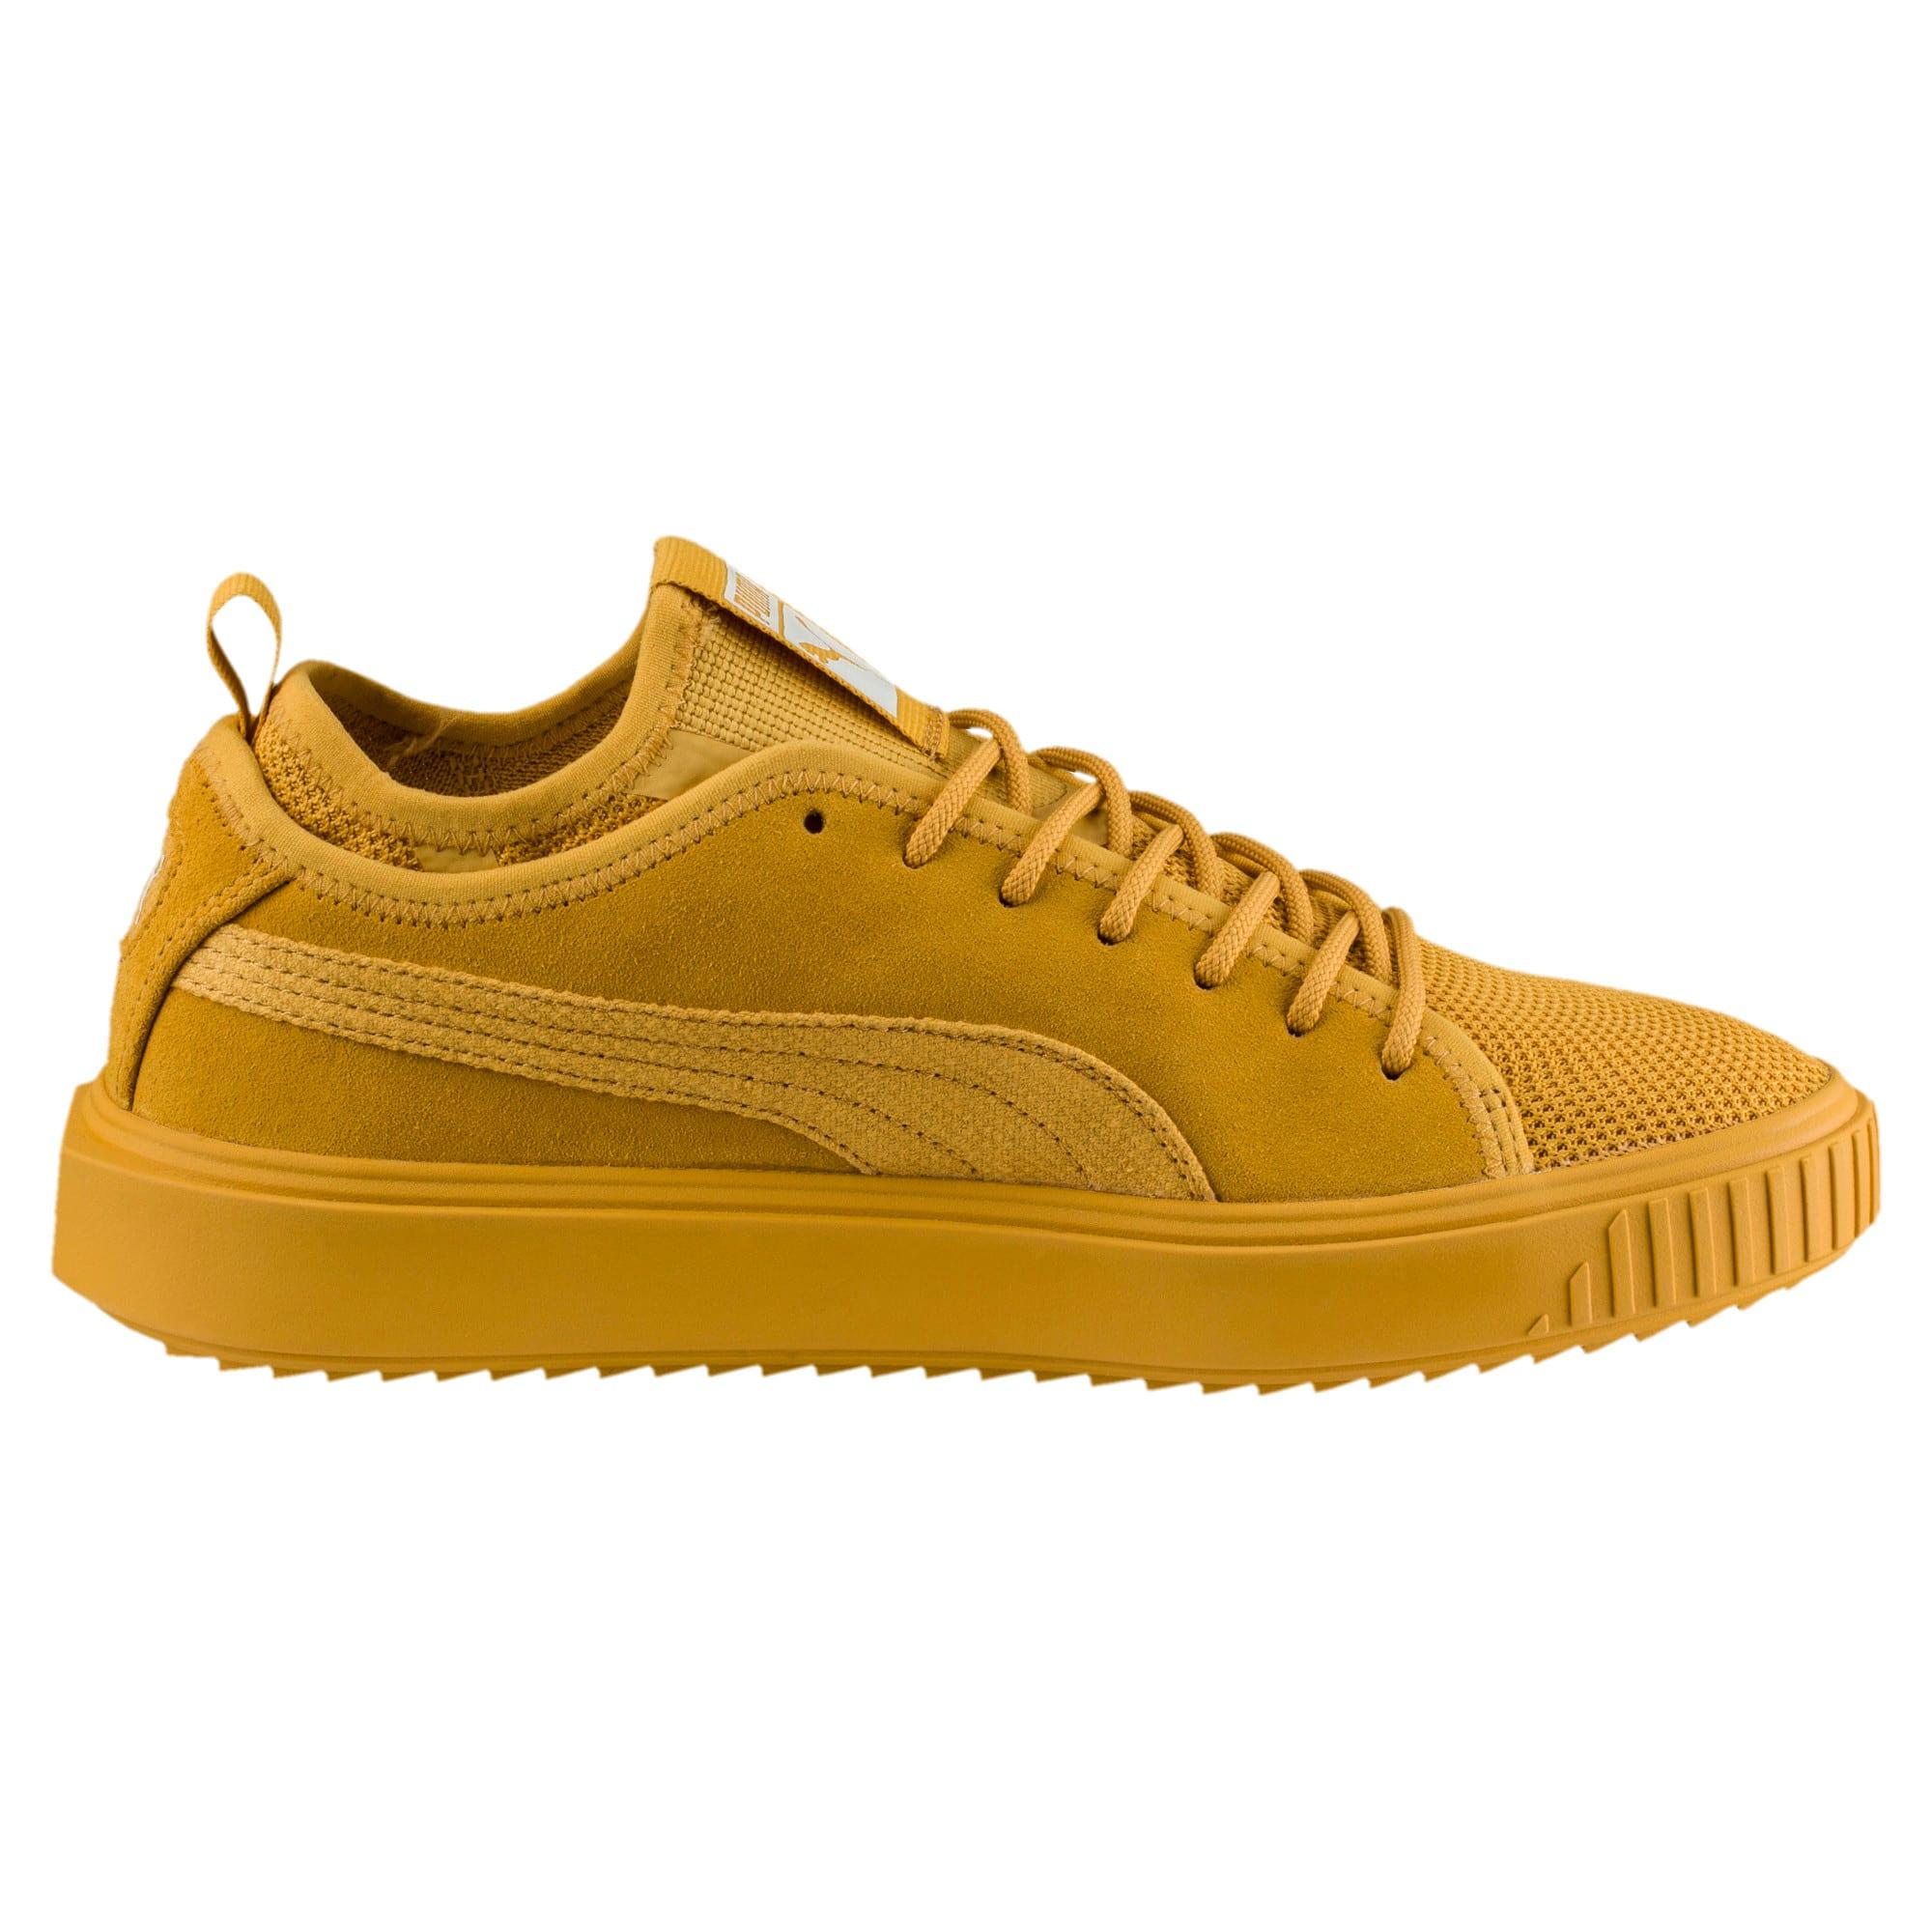 Thumbnail 3 of Breaker Mesh Men's Sneakers, Mineral Yellow-Minl Yellow, medium